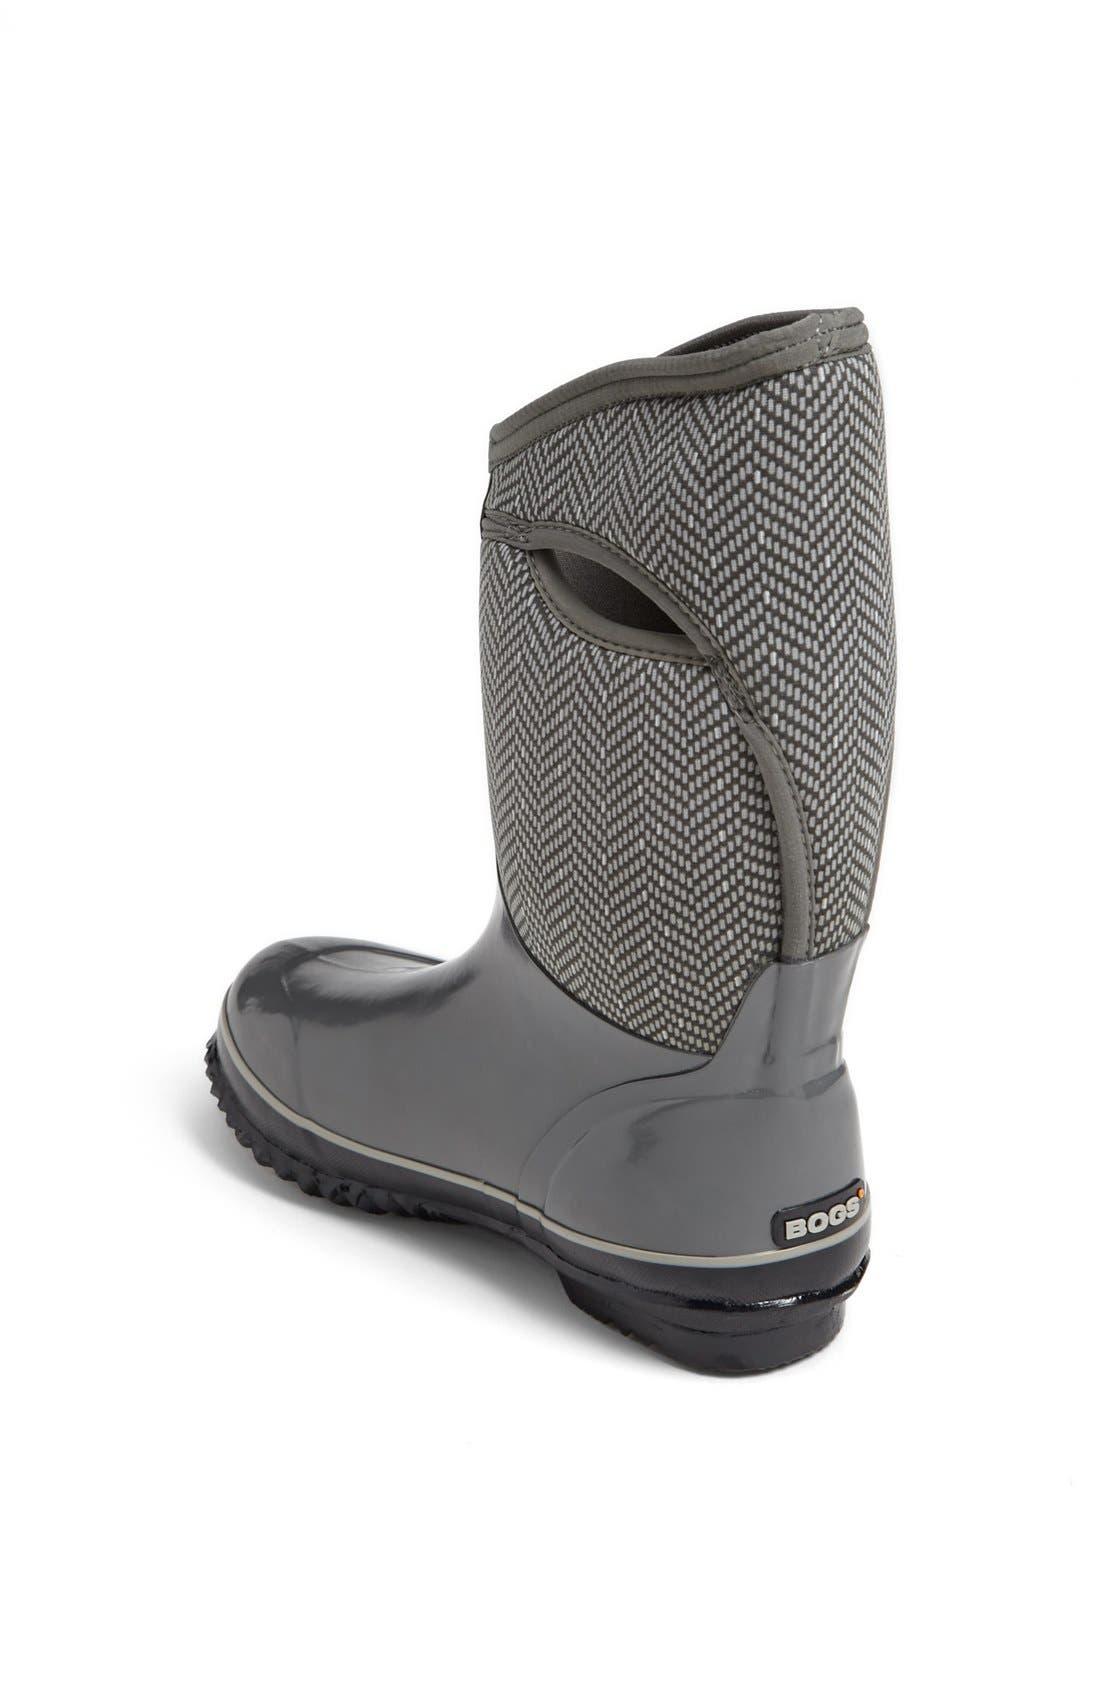 Alternate Image 2  - Bogs Footwear 'Plimsoll' Boot (Little Kid & Big Kid)